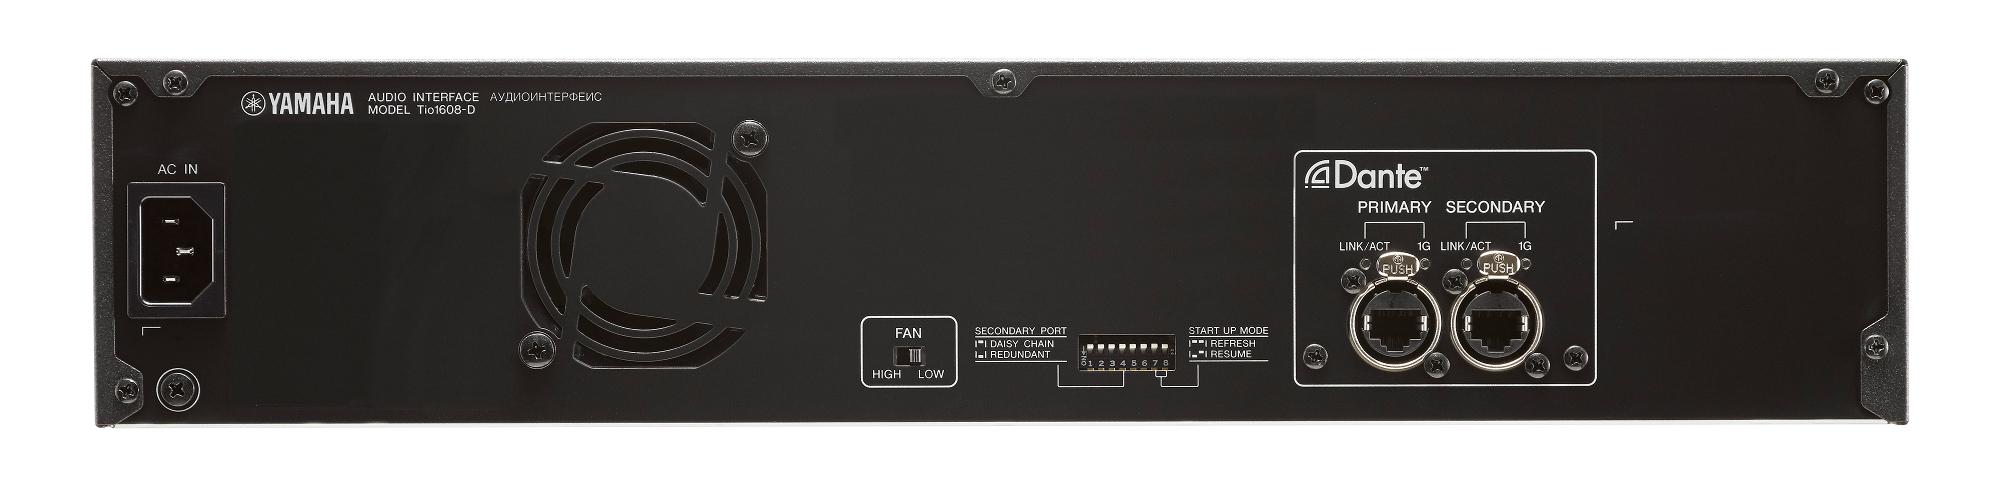 Yamaha tio1608 d 16 input 8 output dante stagebox for tf for Yamaha dante card